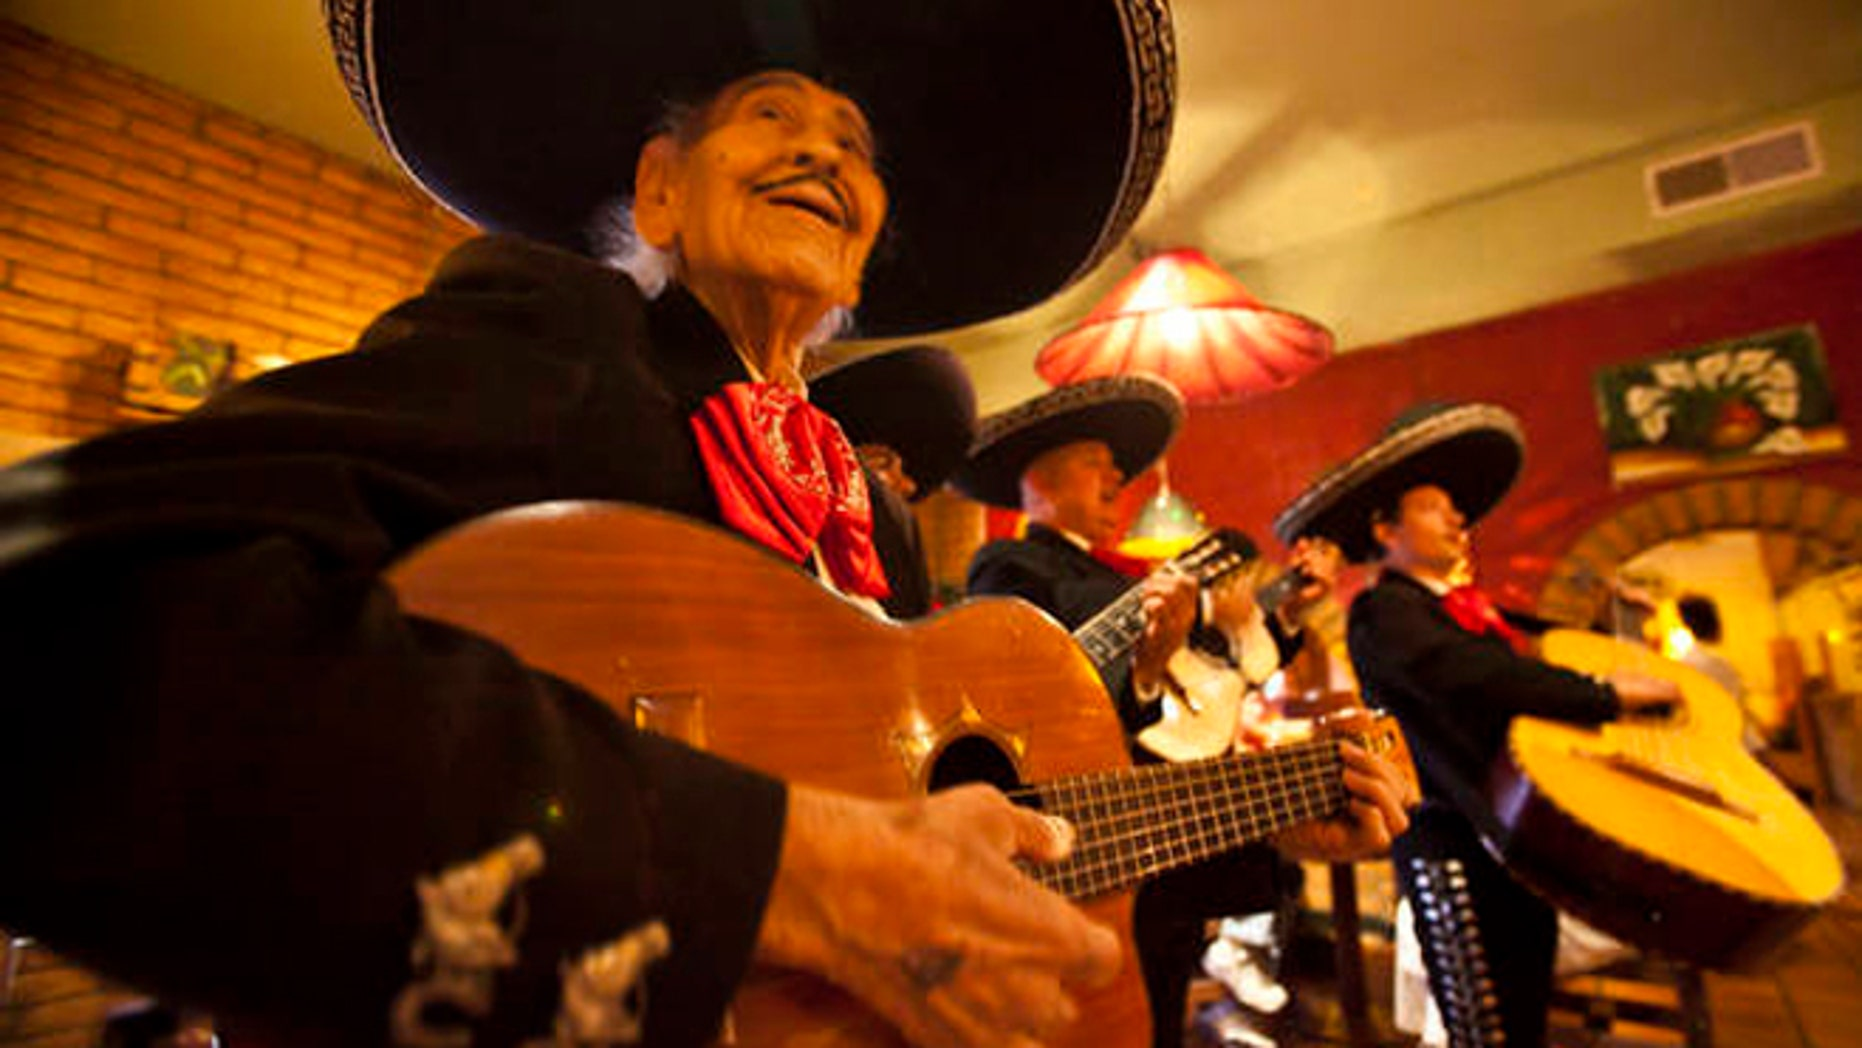 April 13: Singer Manuel Gonzalez, 91, performs with the mariachi band Del Monte at Rio Mirage Cafe and Cantina in El Mirage, Ariz. (AP Photo/The Arizona Republic, Michel Duarte)